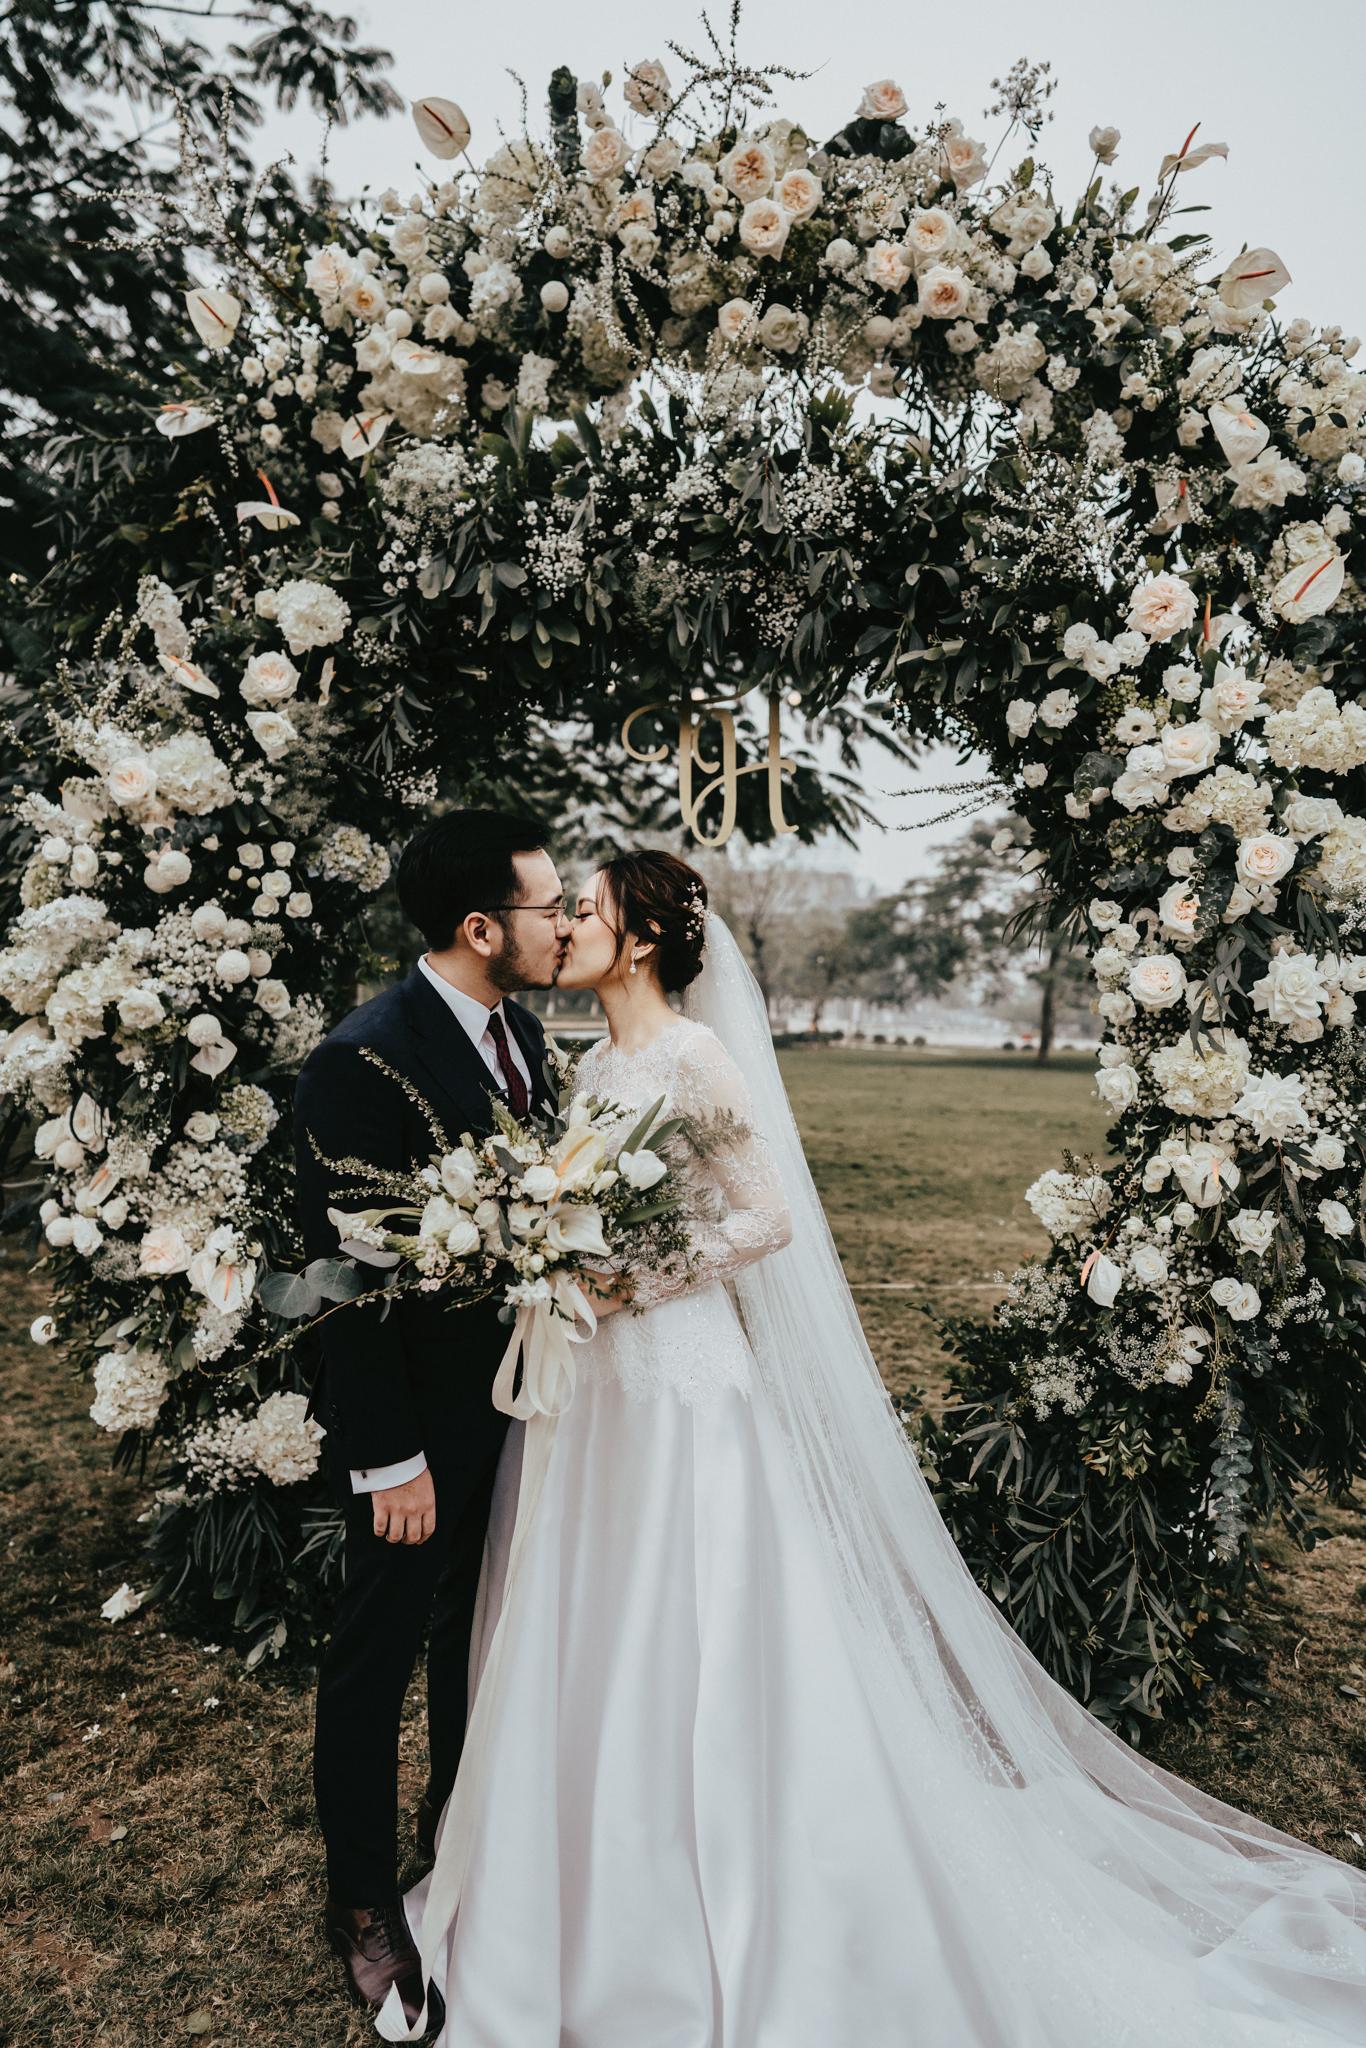 JWMarriott Ha Noi Intimate Wedding of Trang Hi well captured by Hipster Wedding Vietnam Wedding Photographer-35997.jpg